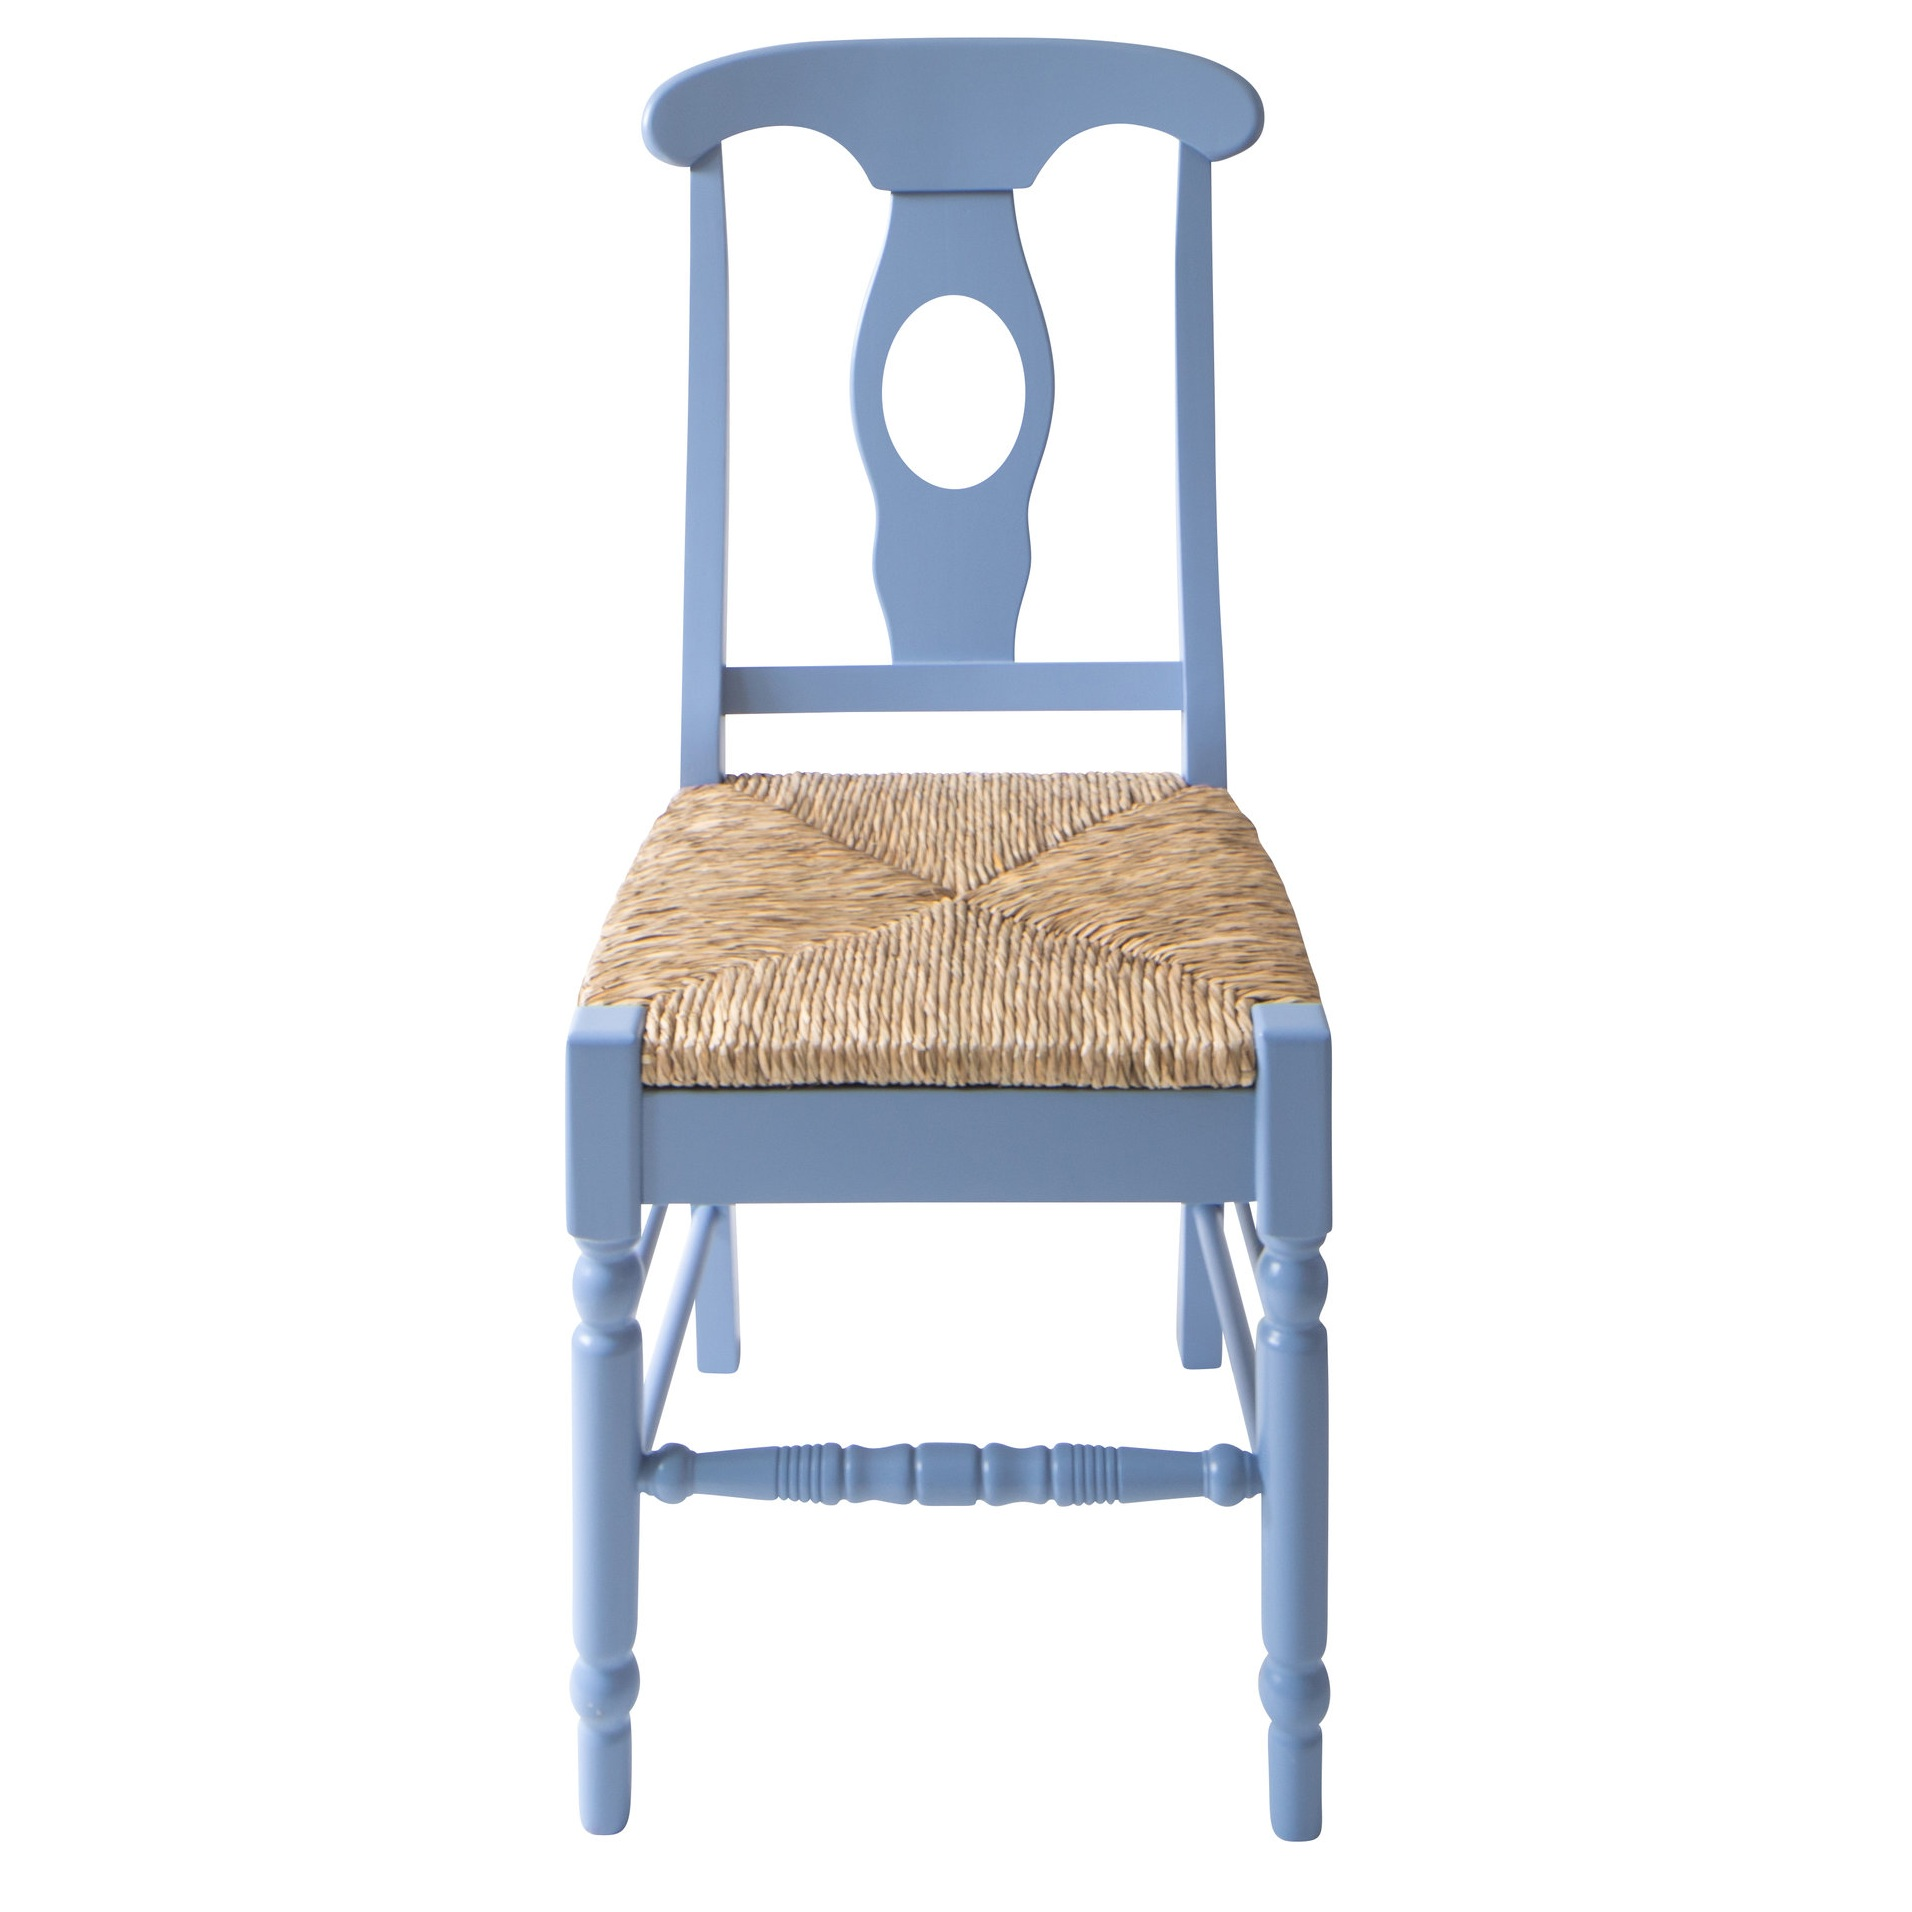 MWW_Chair_C-1200B_Sophie_Cane_Heron_Web.jpg